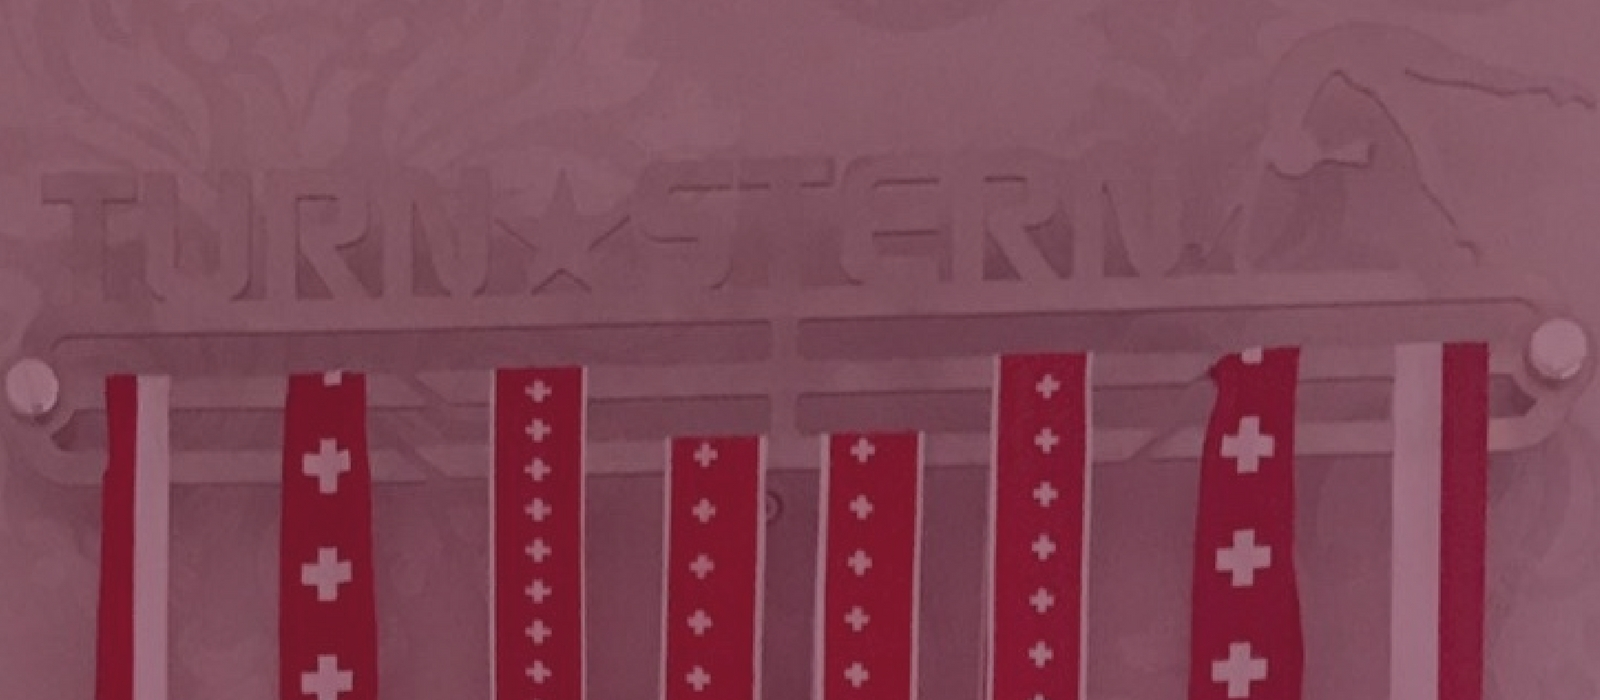 Stilvoller Medaillenhalter für Gymnastics in Edelstahl